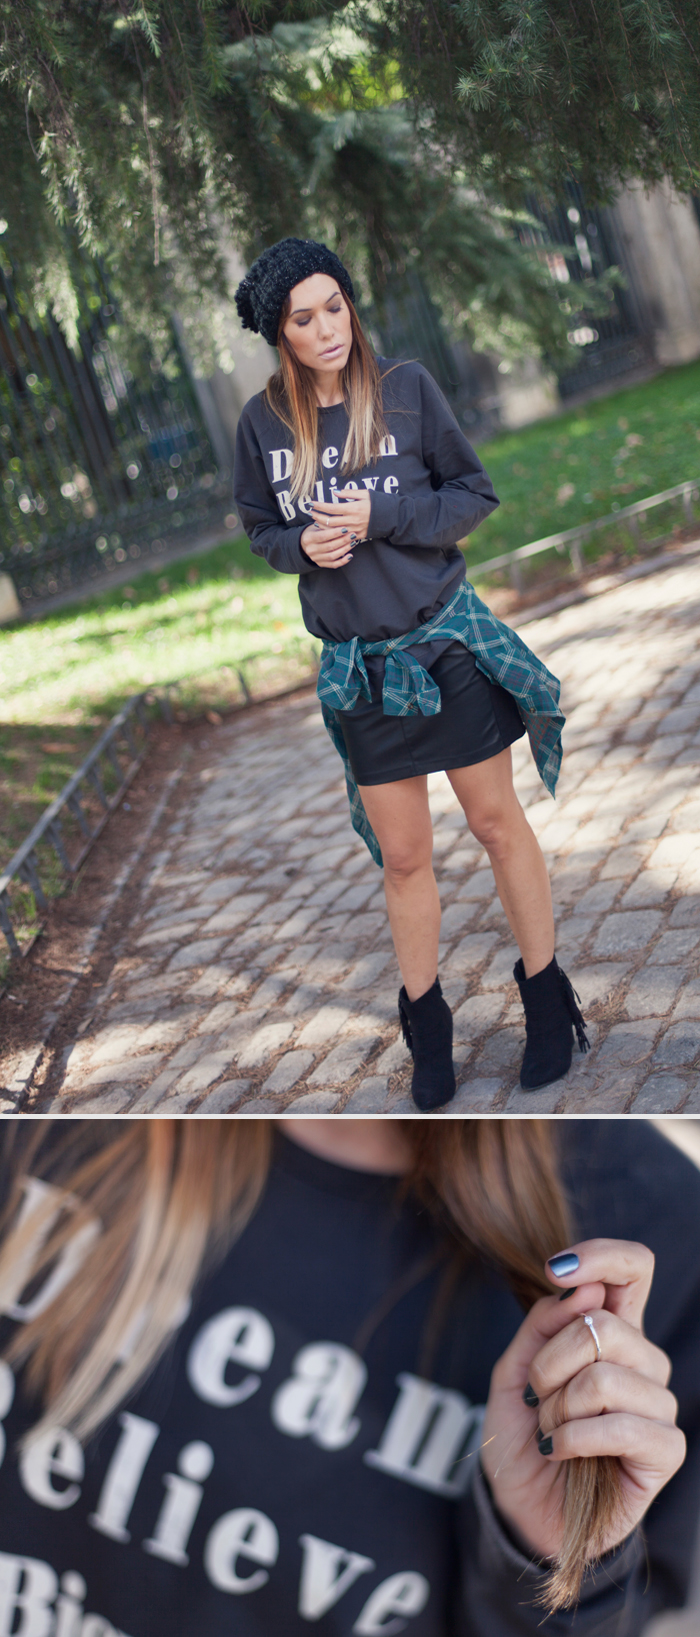 street style barbara crespo dream believe a bicyclette sweatshirt botanical garden madrid outfit